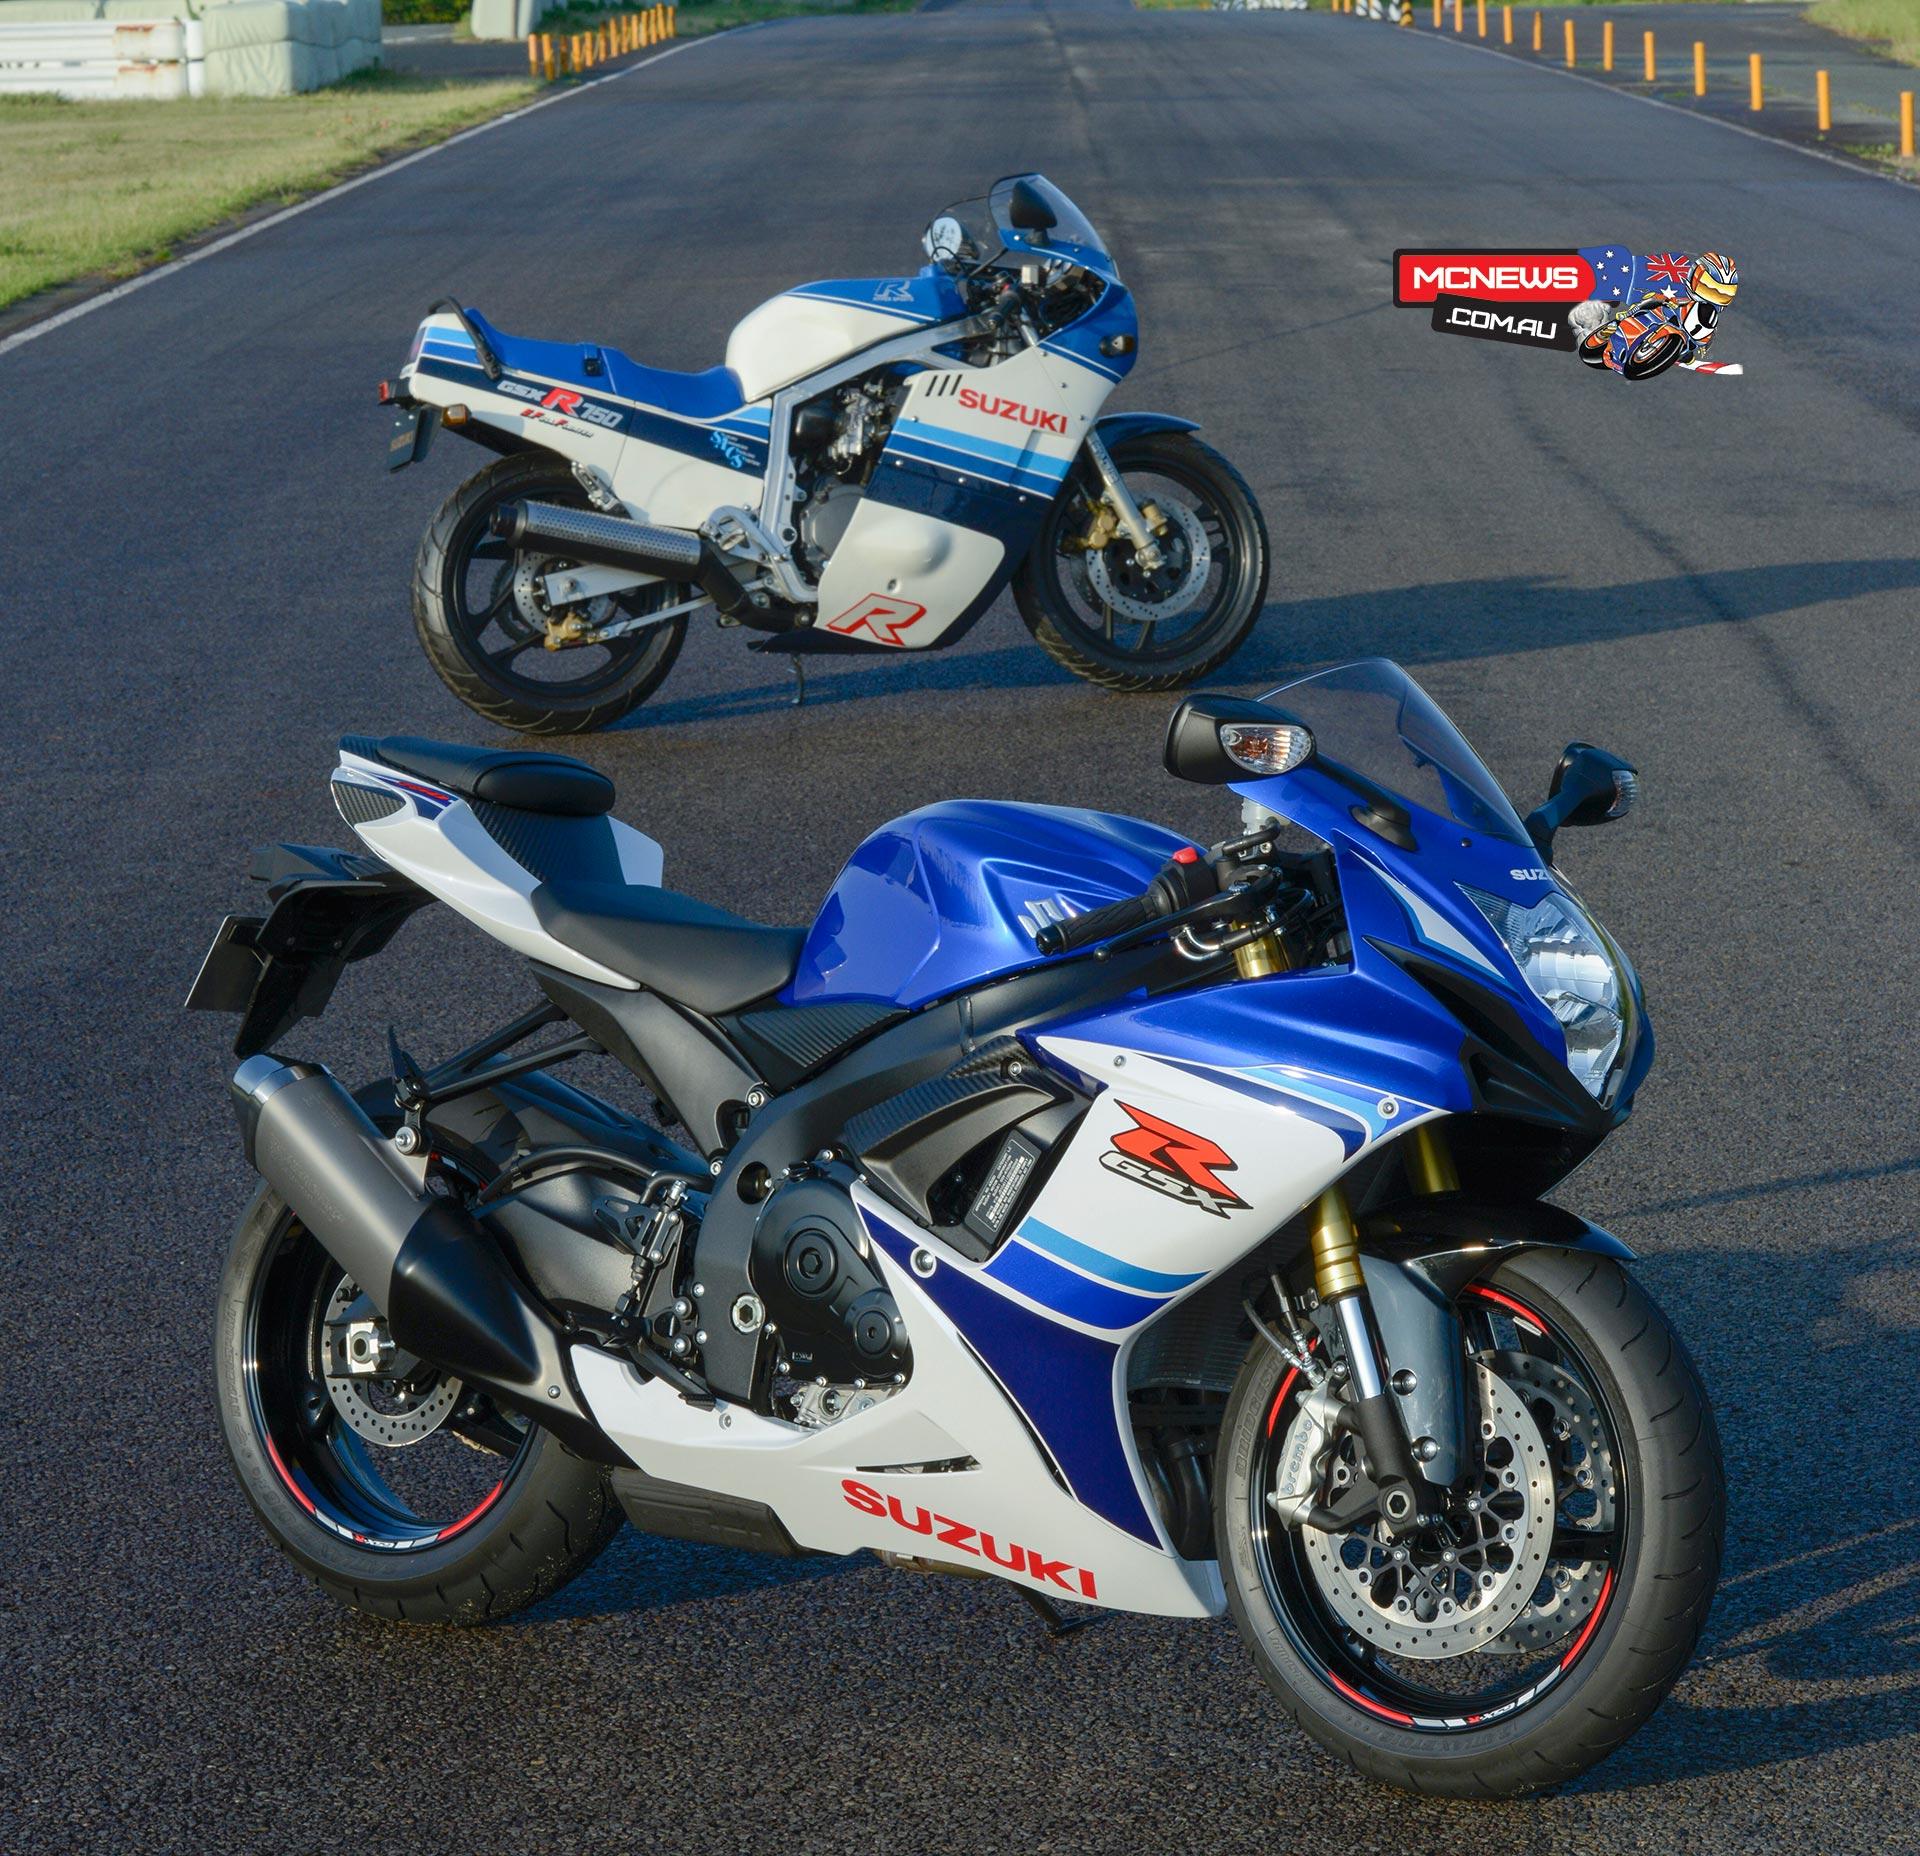 Suzuki GSX-R 30th Anniversary Editions | MCNews.com.au